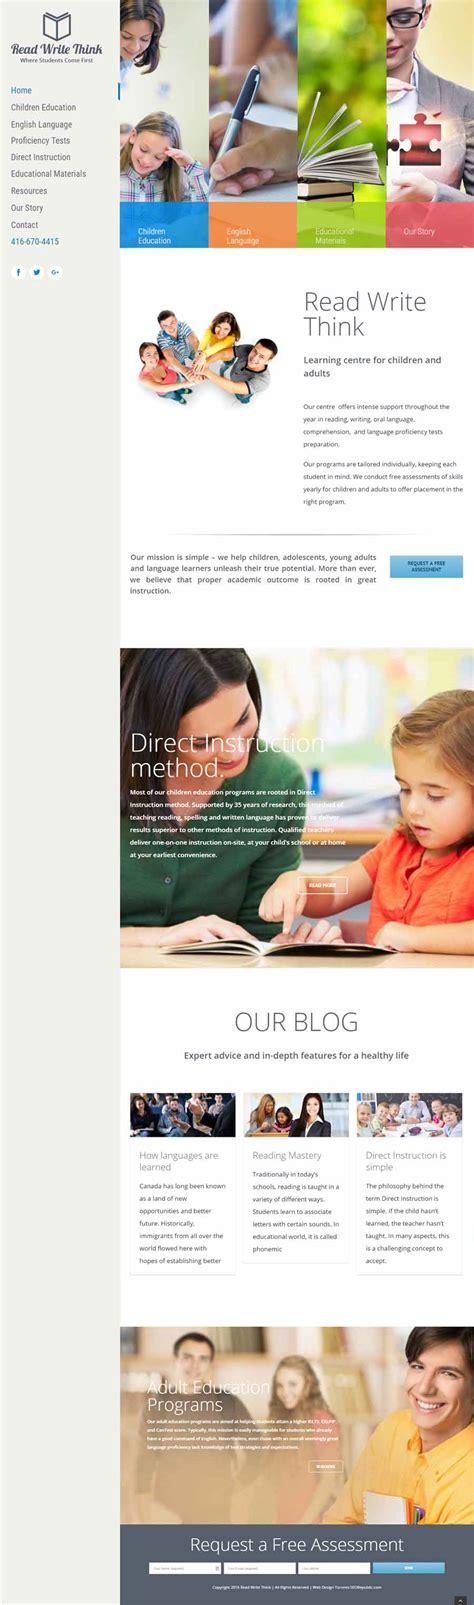 website layout design writing read write think website design toronto seorepublic com